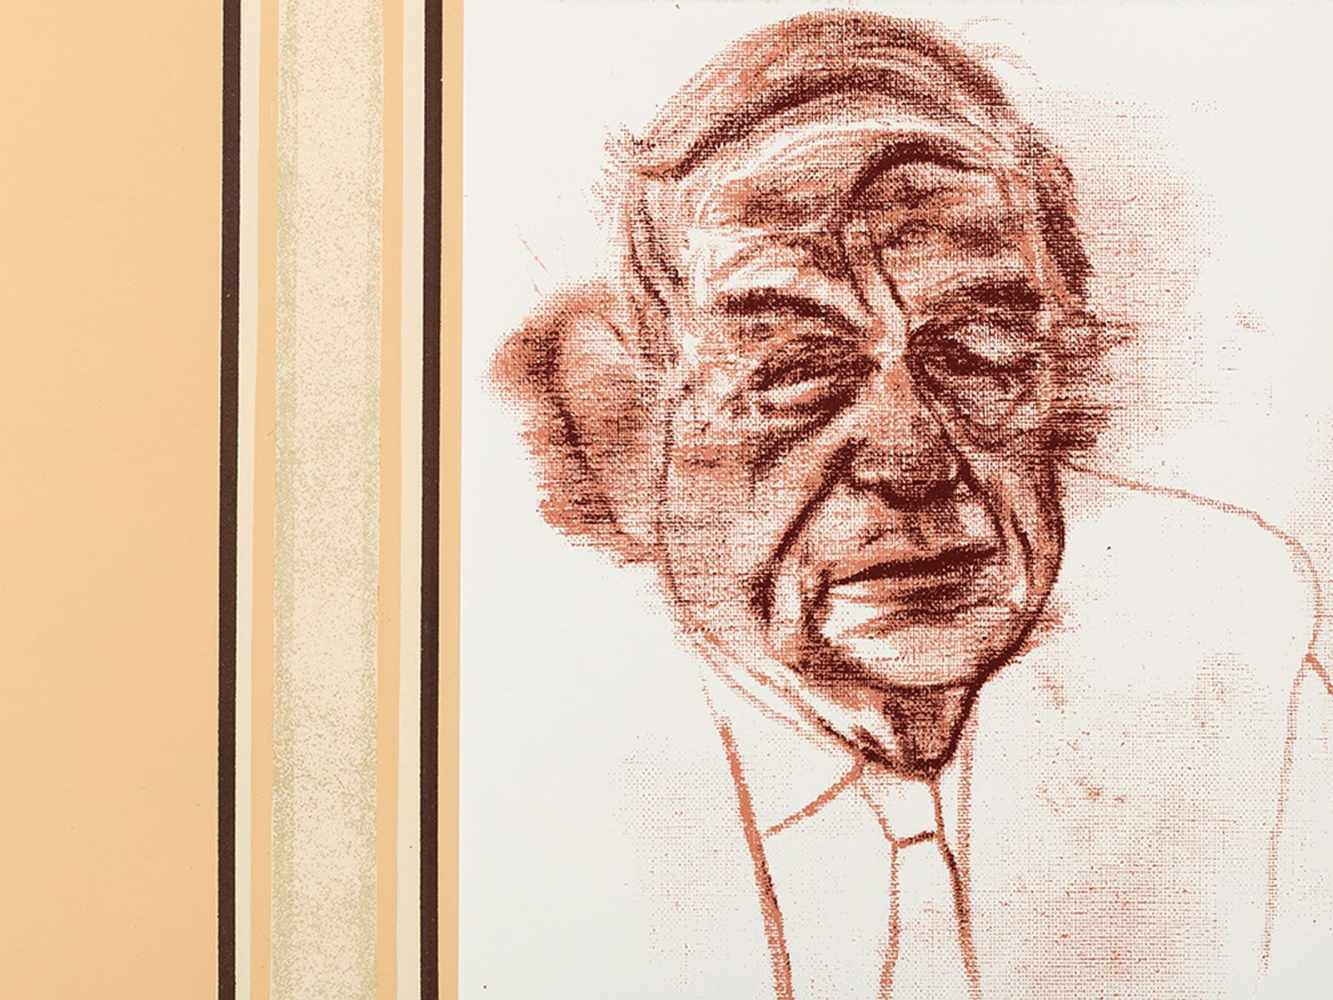 R.B. Kitaj (1887-1948), W.H. Auden, Color Serigraph, 1969 - Image 6 of 10